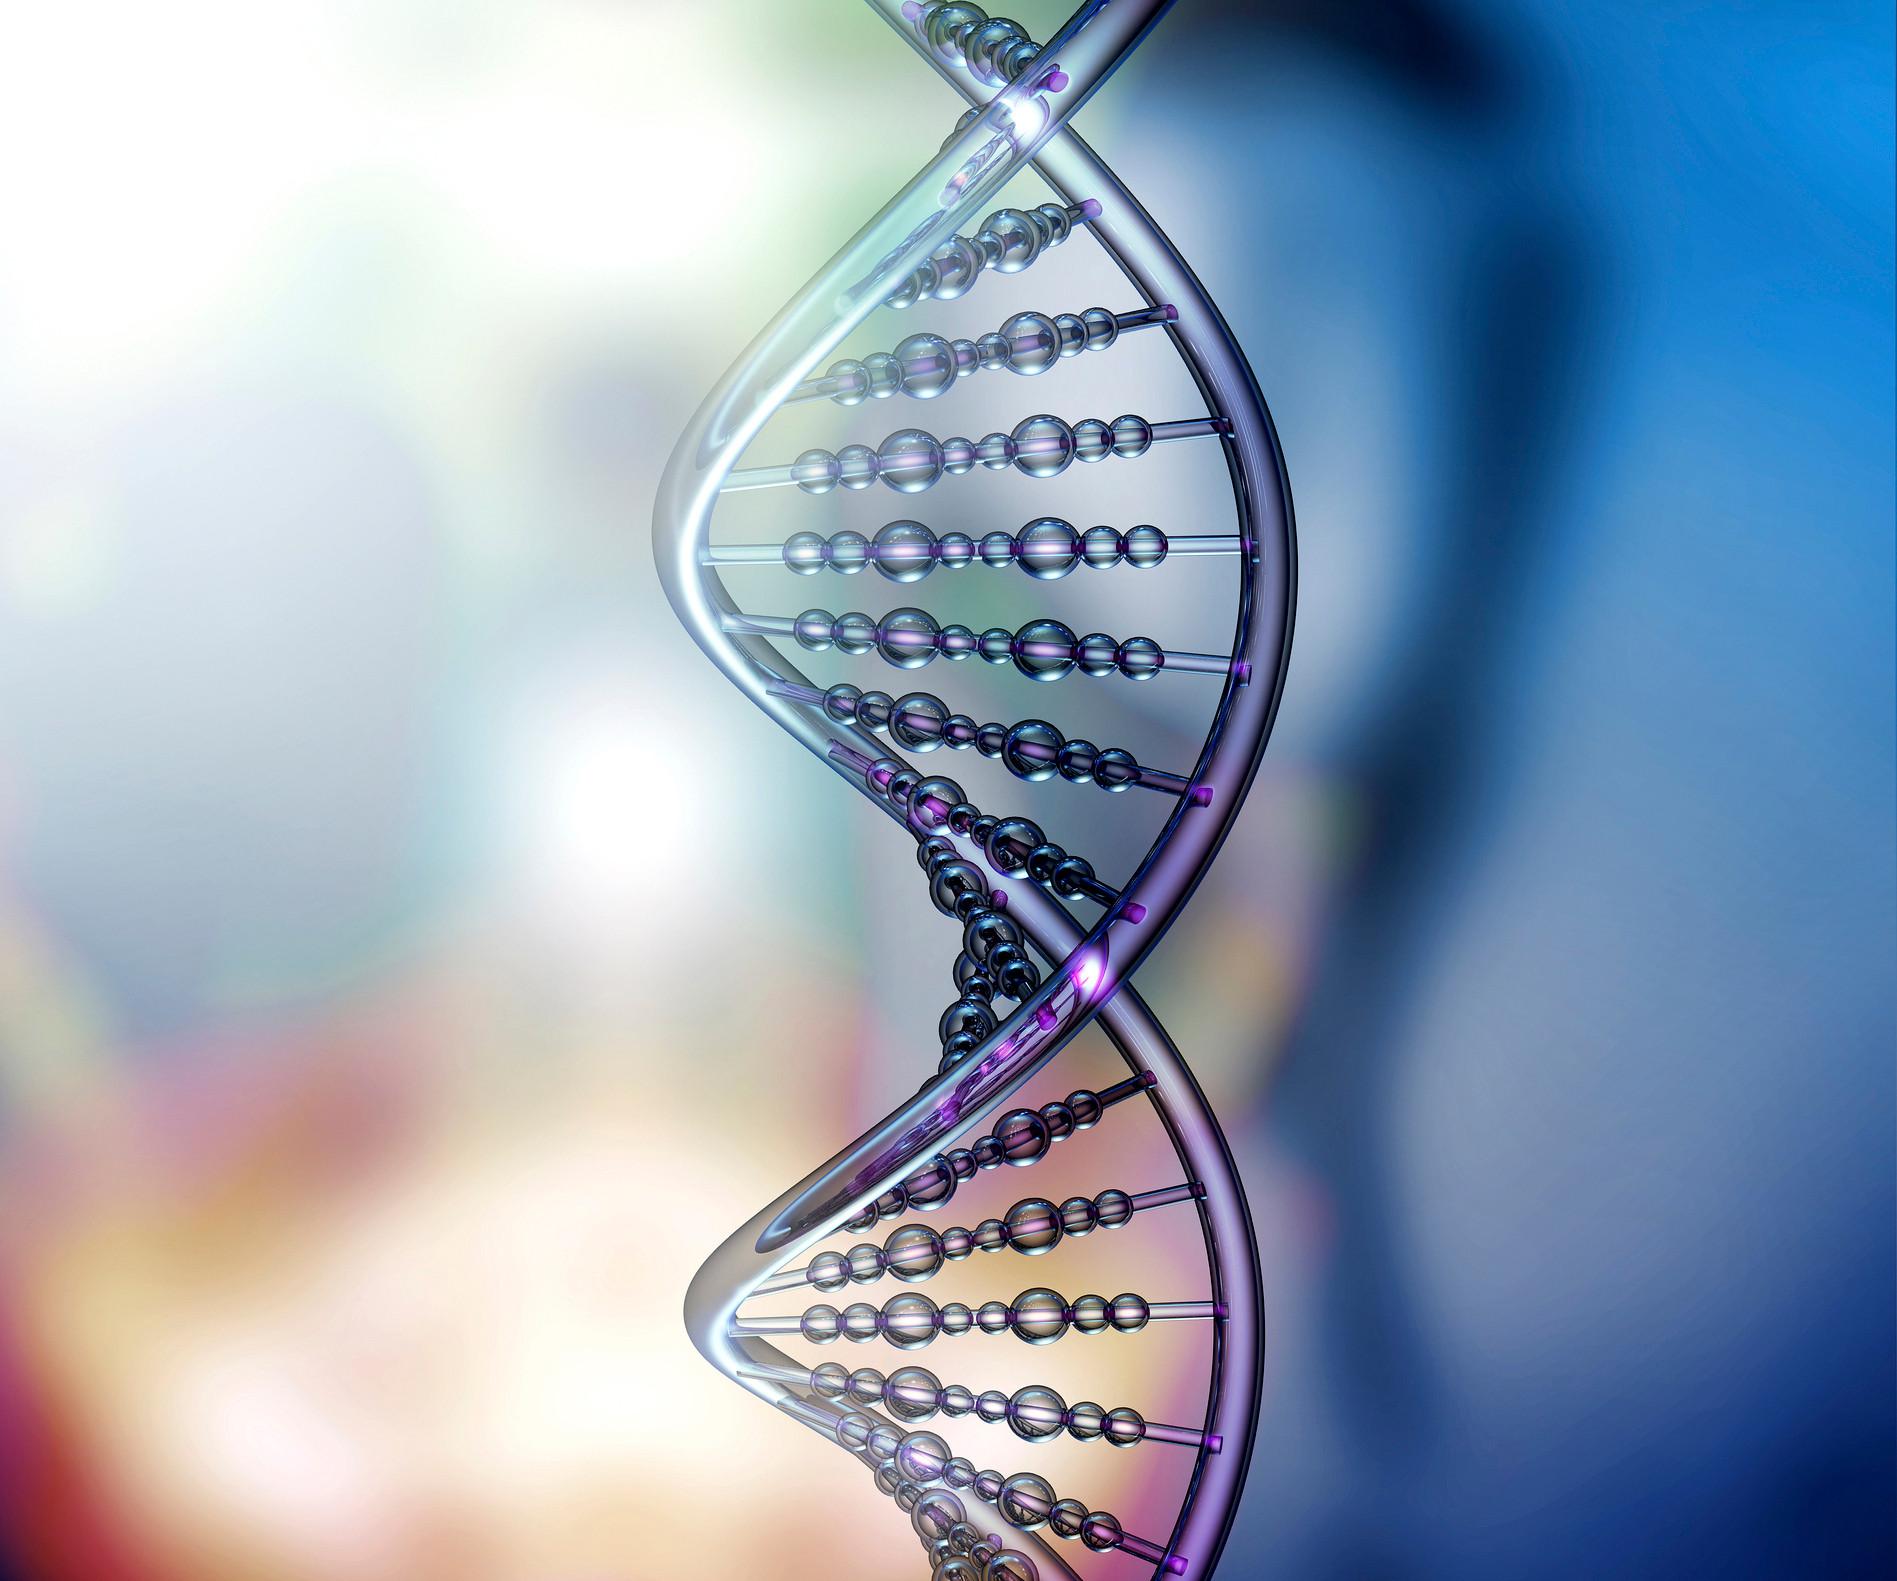 DNA - Aktivierung